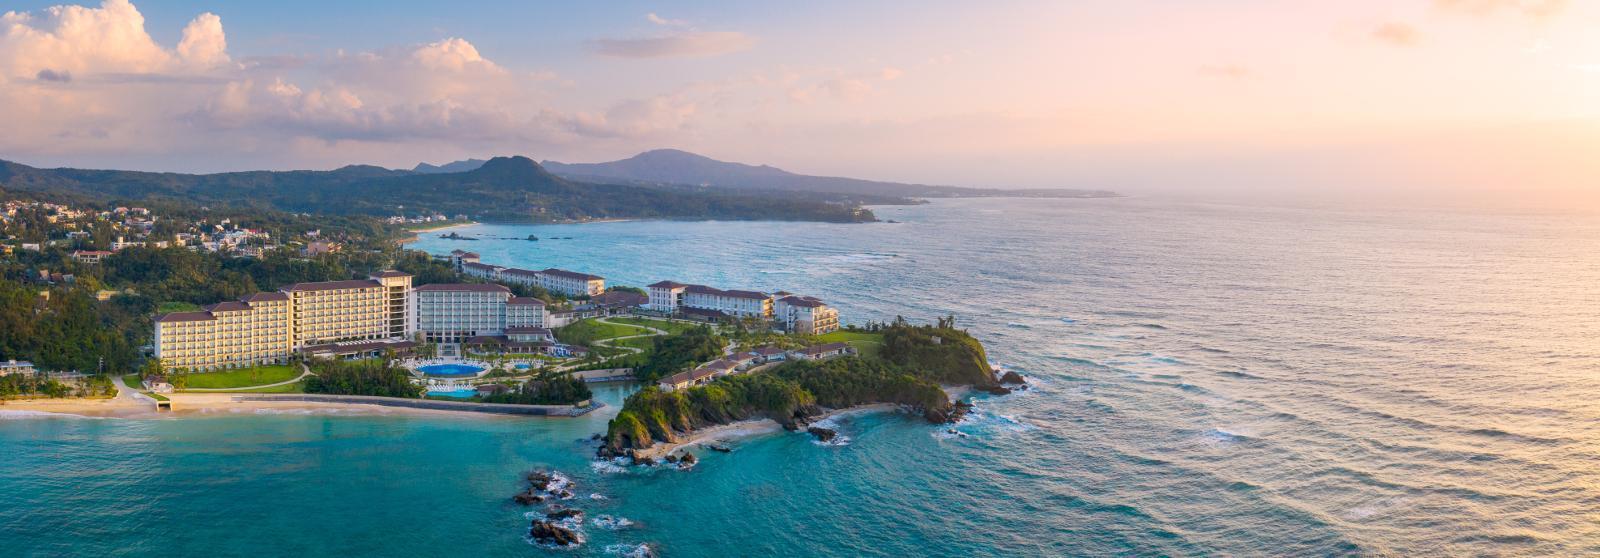 冲绳海丽客兰尼酒店(Halekulani Okinawa)【 冲绳,日本】 酒店  www.lhw.cn